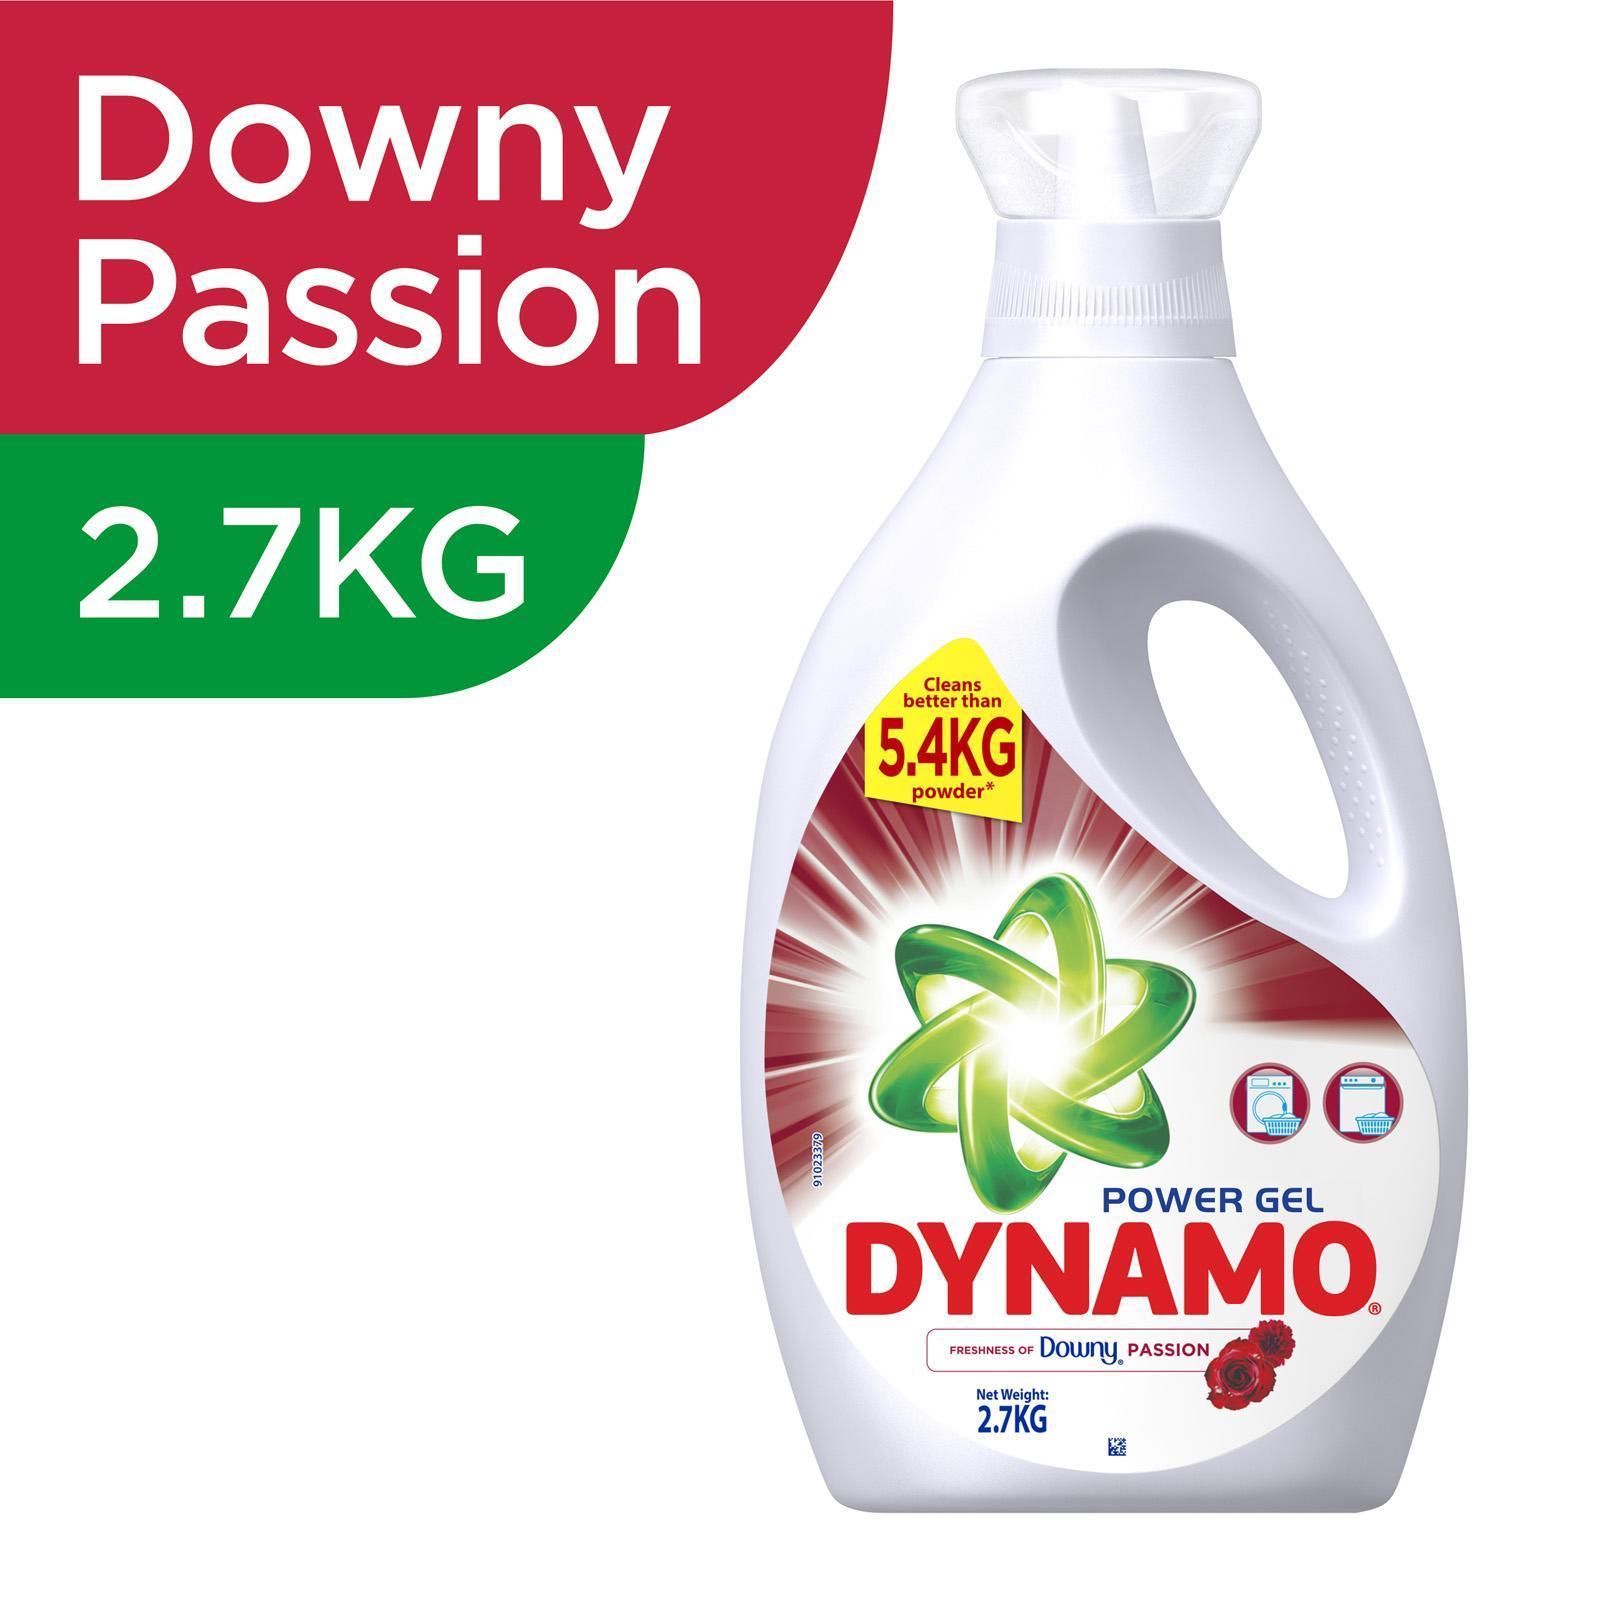 Dynamo Power Gel Freshness of Downy Laundry Detergent